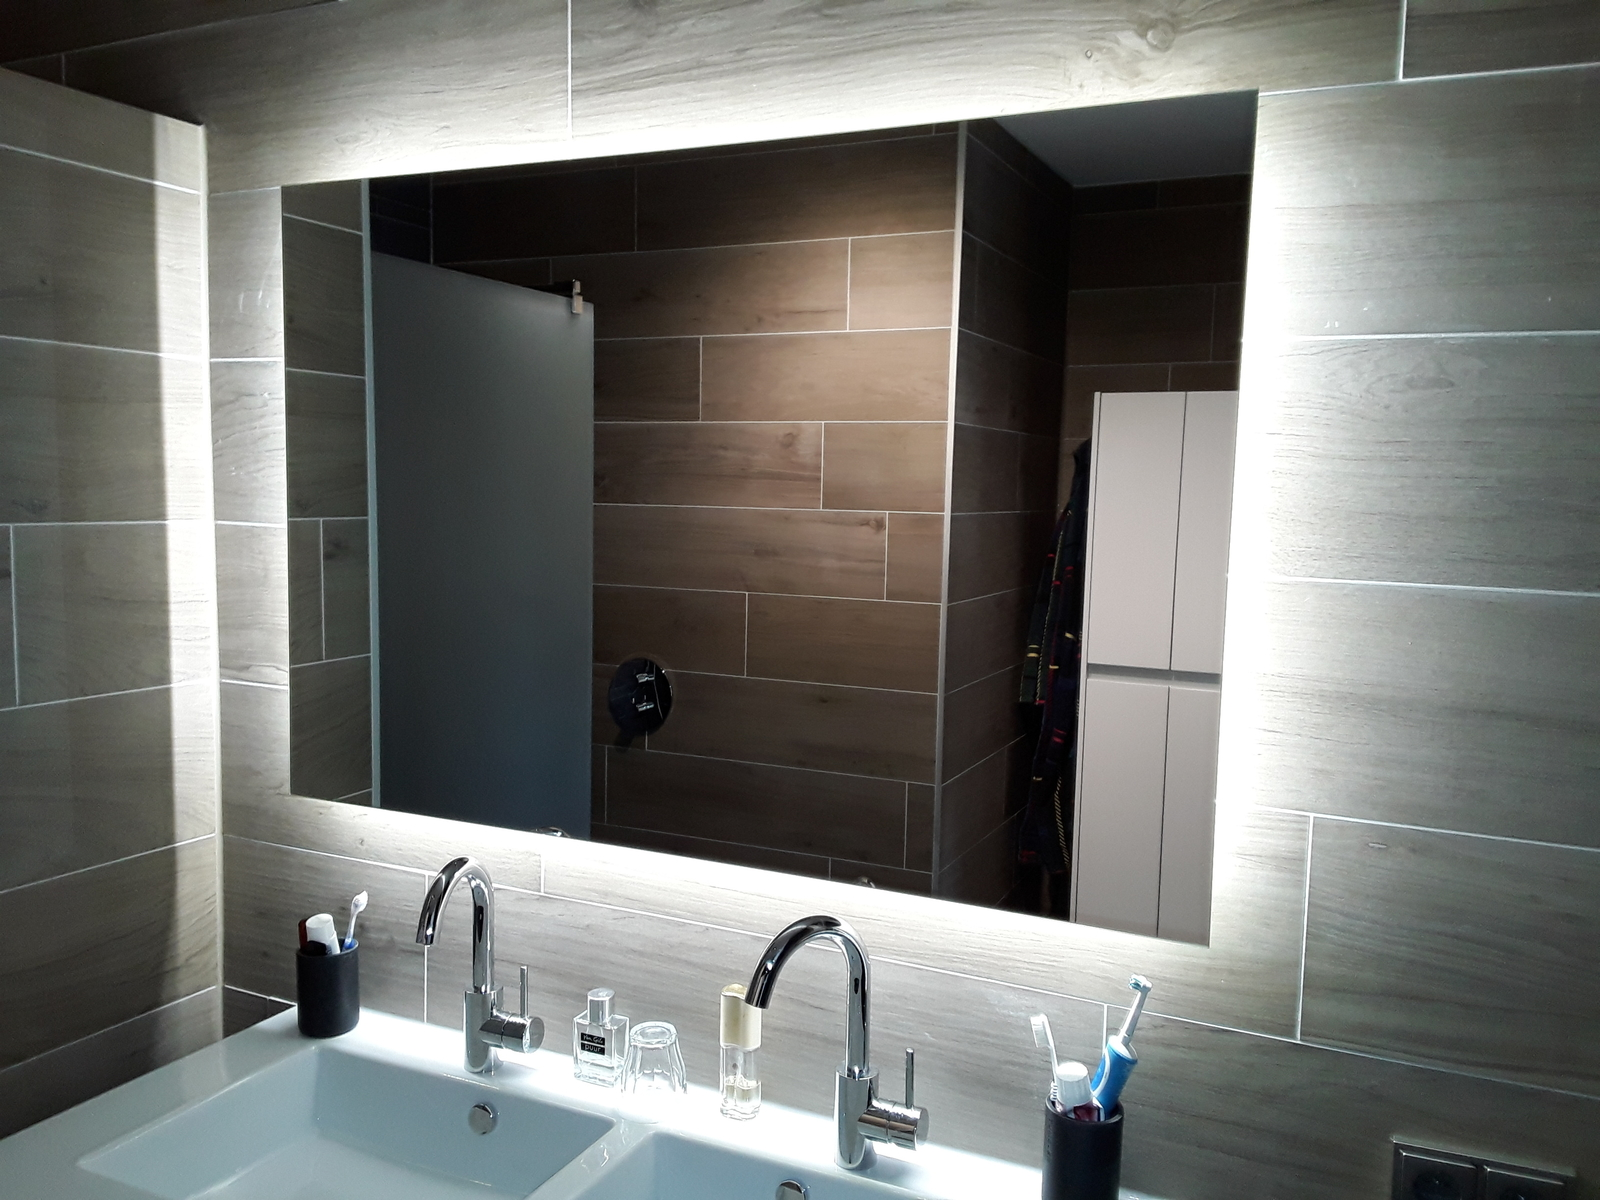 Complete badkamer verbouwing diemen tuijps amsterdam